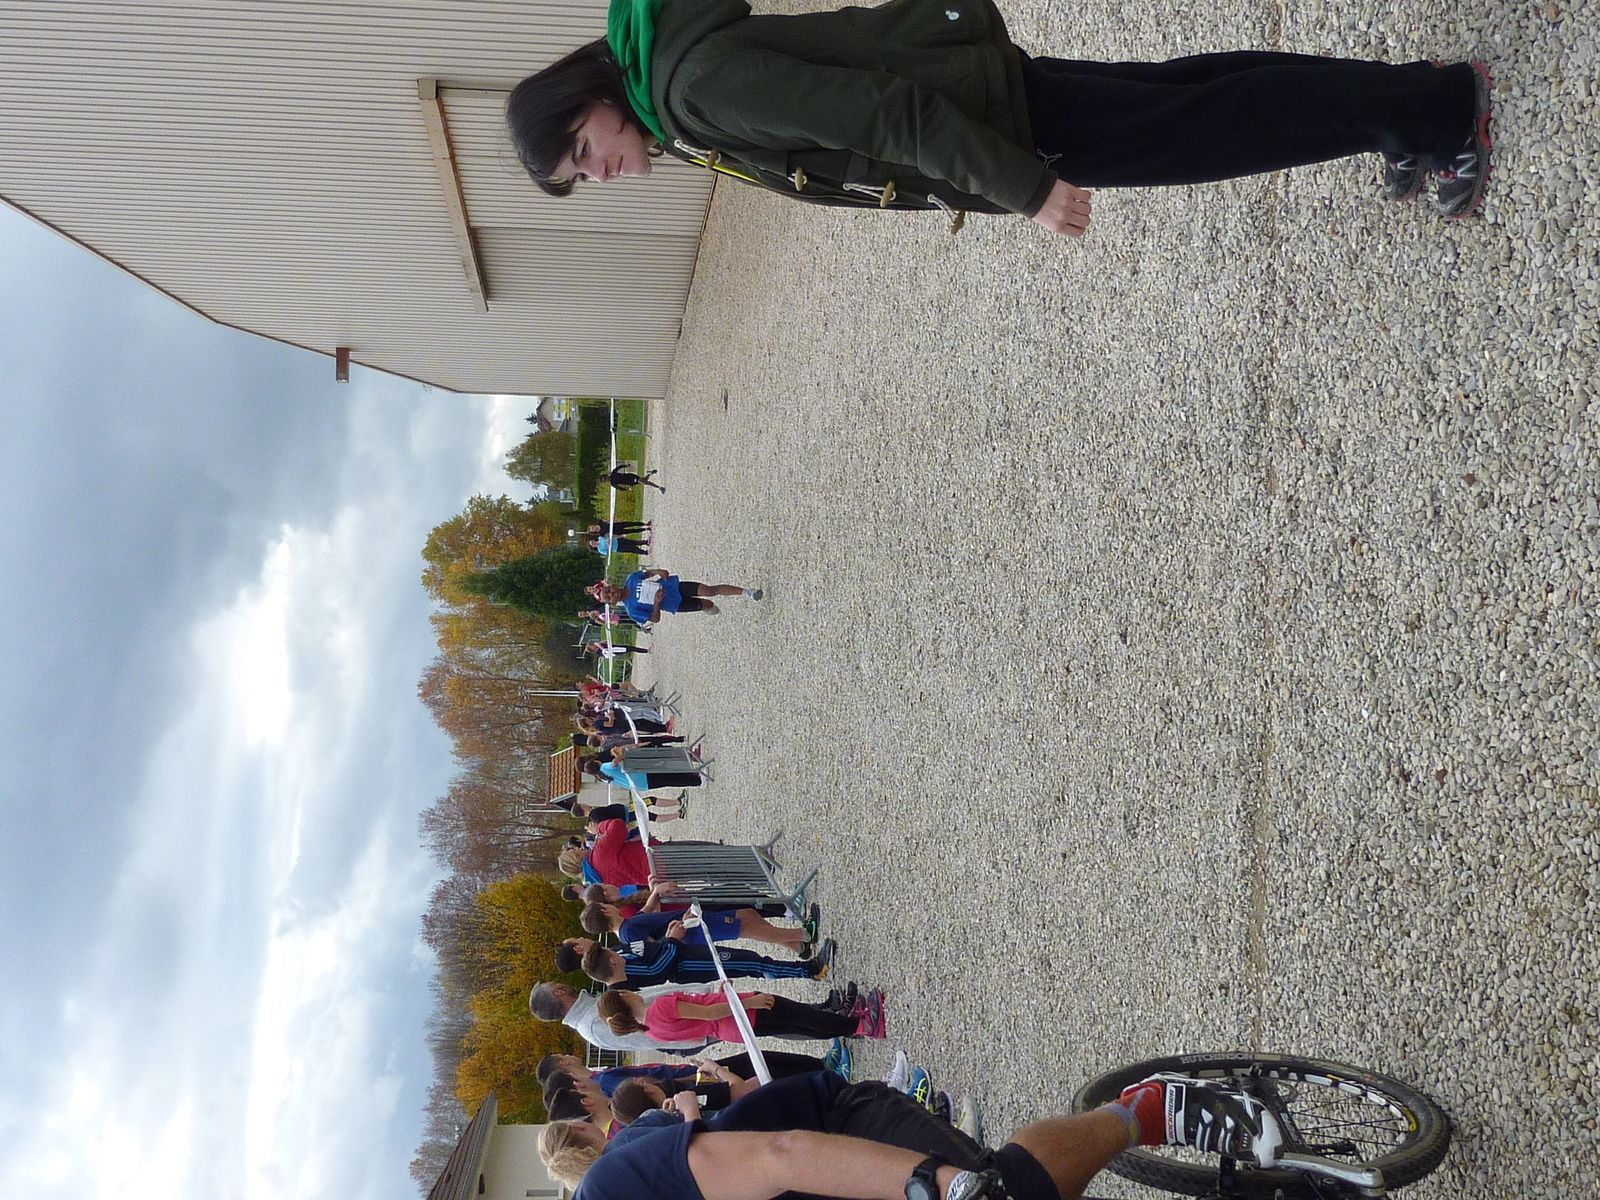 Cross et run and bike de District Romilly 04/11/15